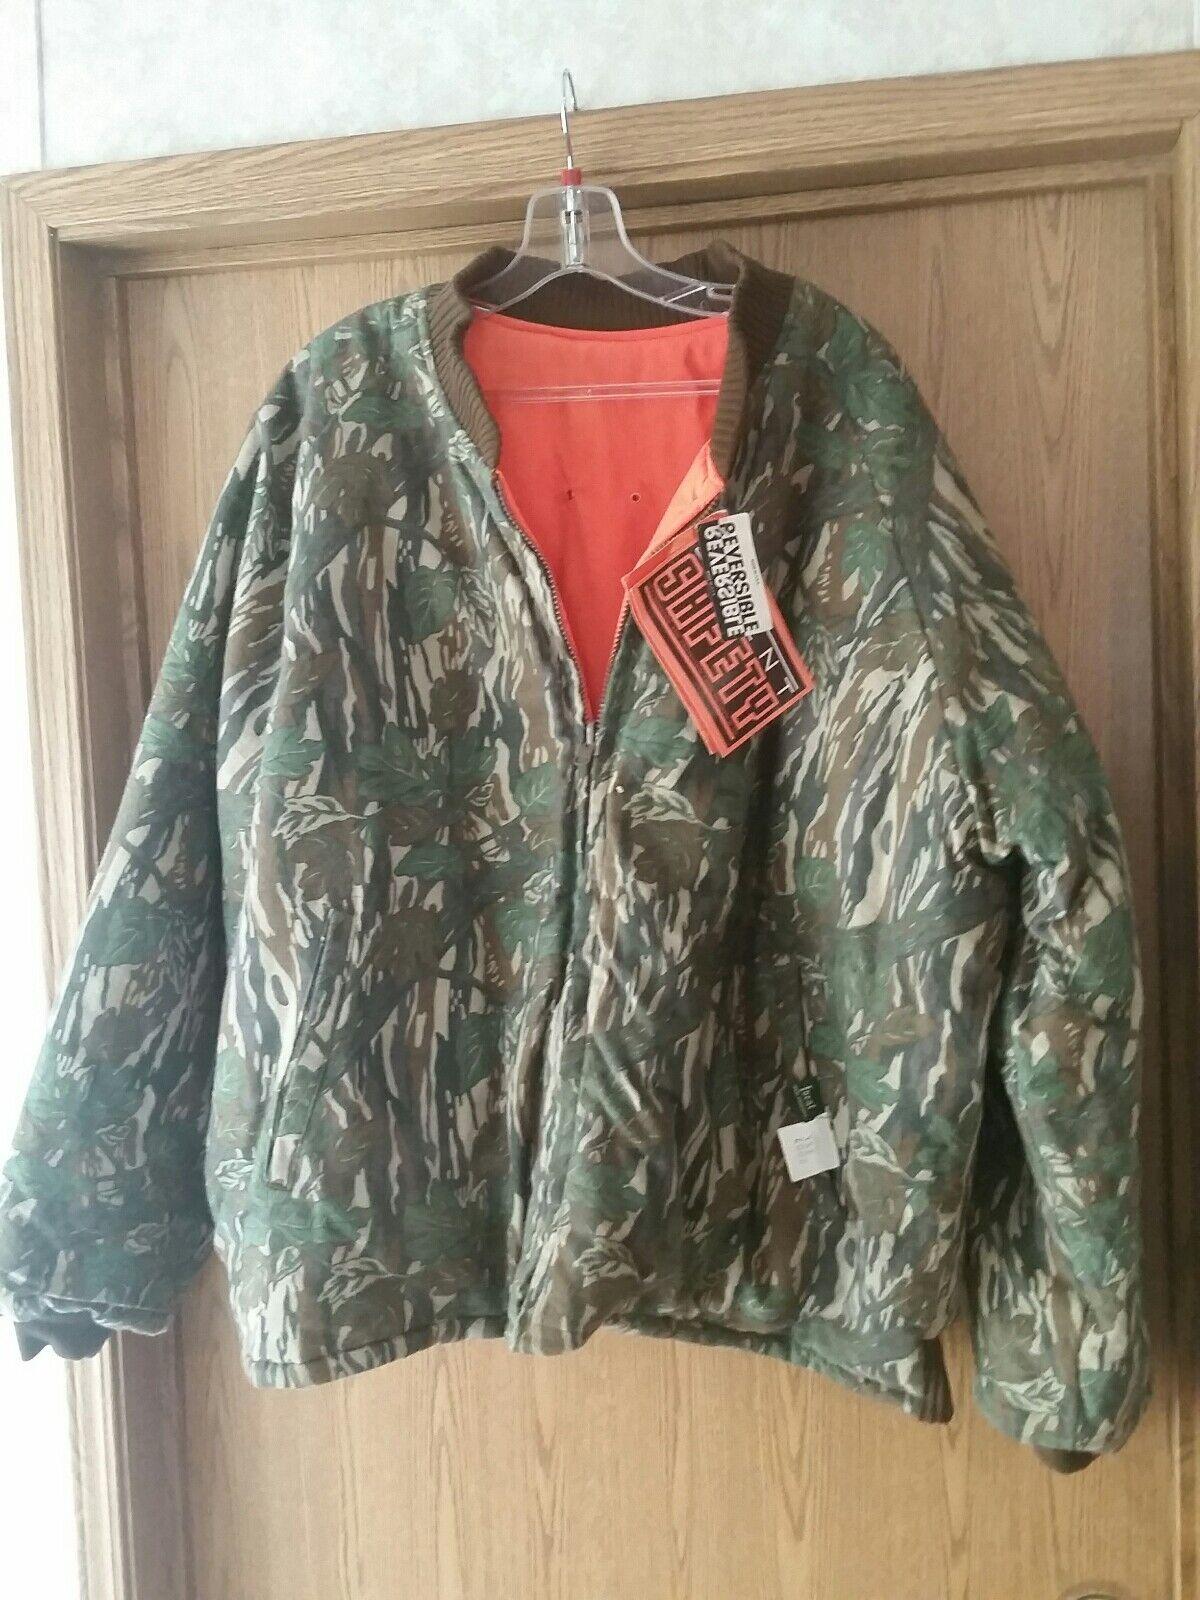 Ideális Silent Leaf Chamois Reversible Jacket XXL.2XL.NWT.Camouflage / Blaze.USA